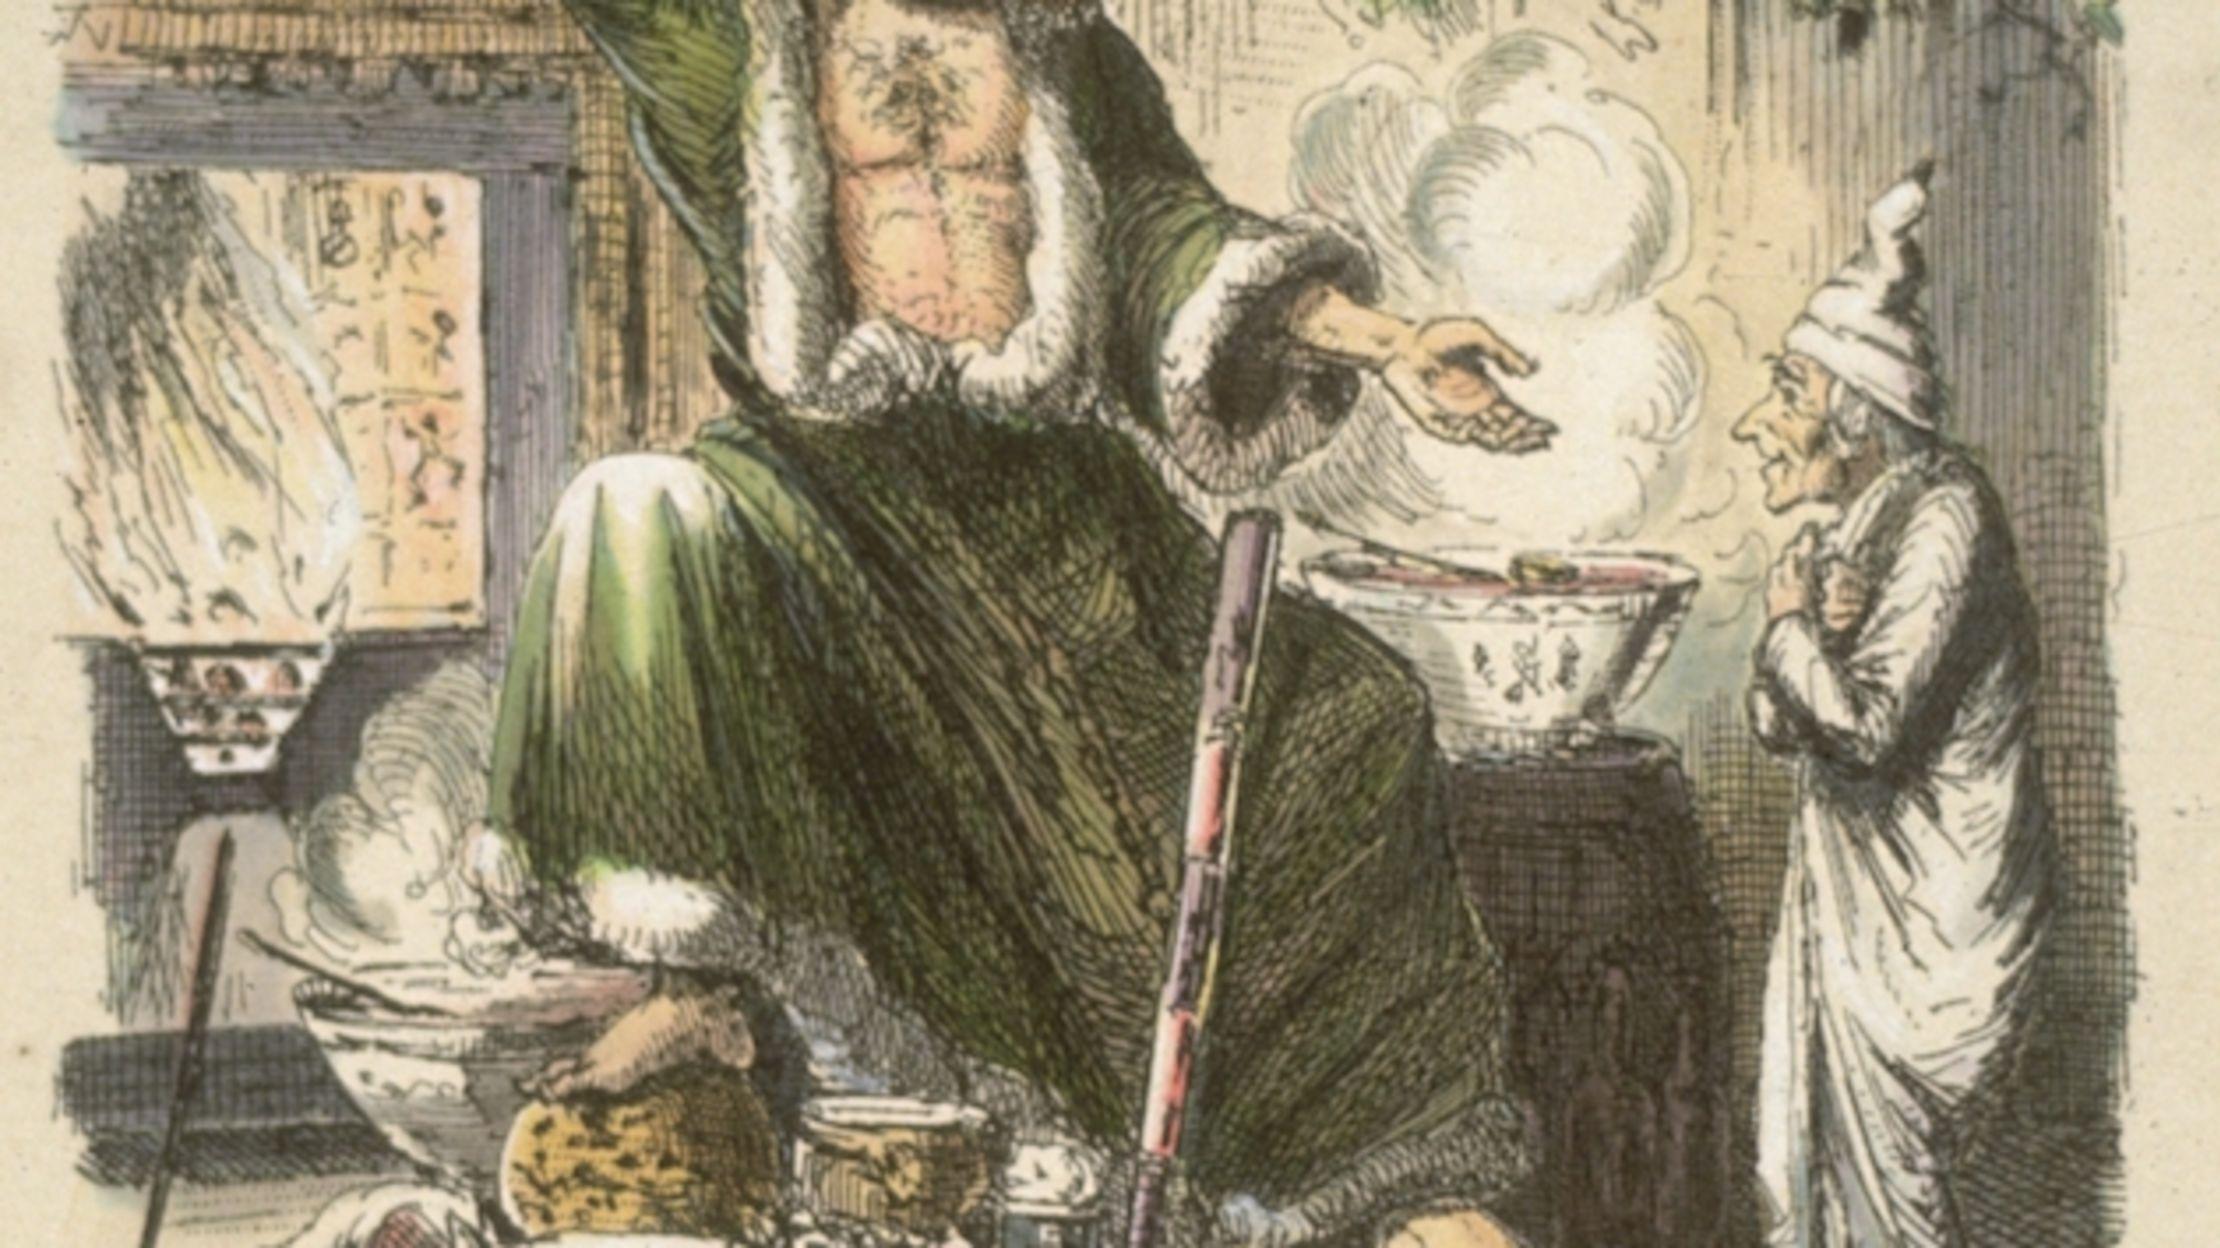 Listen to Neil Gaiman Read Charles Dickens' 'A Christmas Carol' | Mental Floss